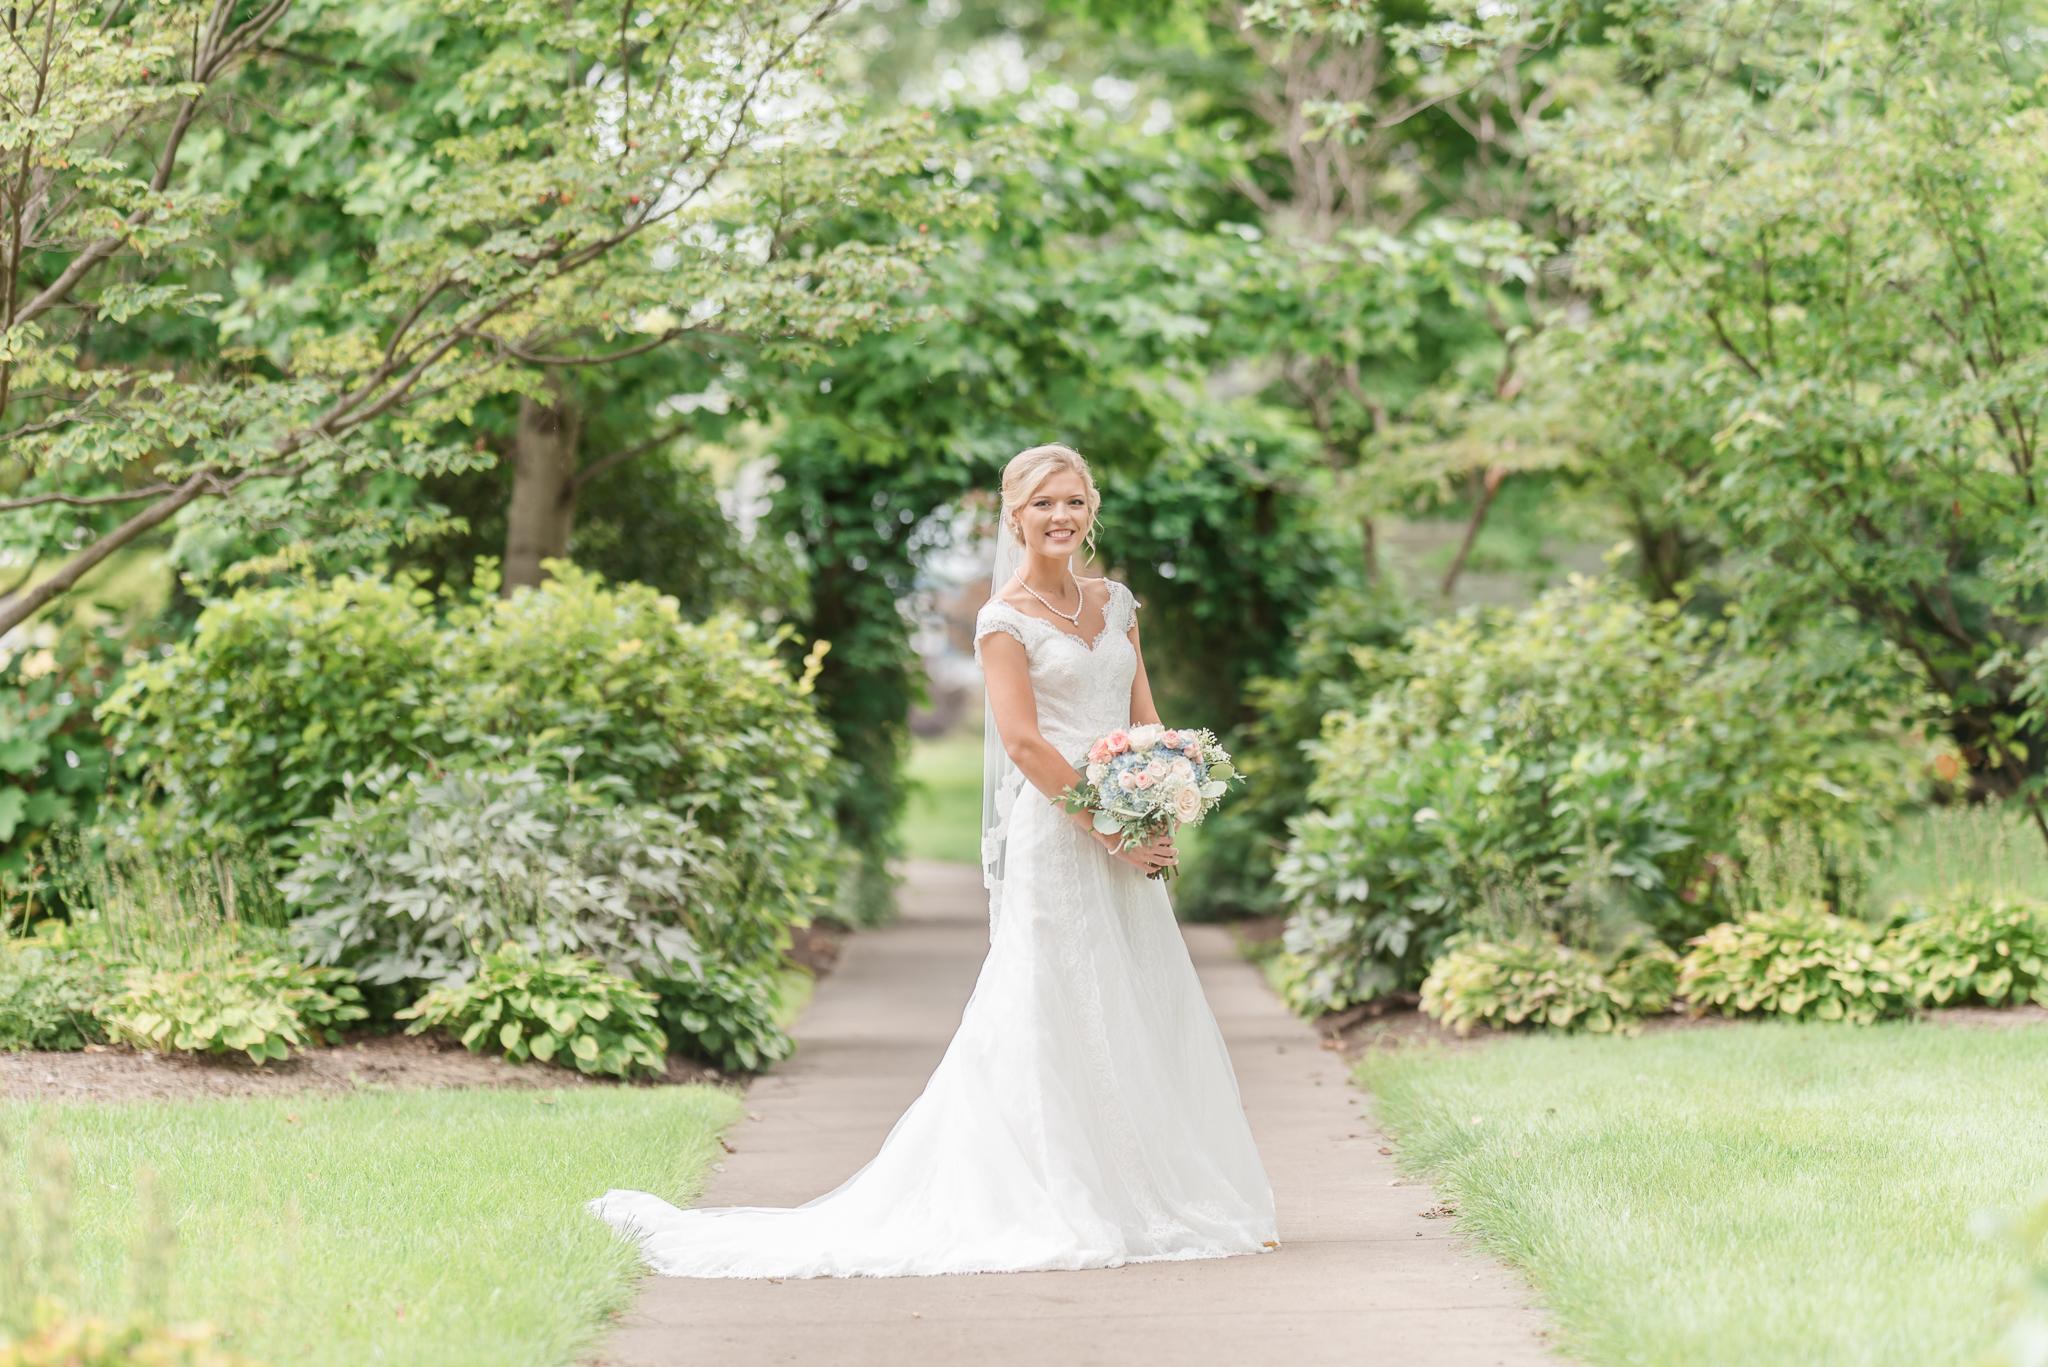 Westminister Hall Wedding Winona Lake Indiana9005.jpg